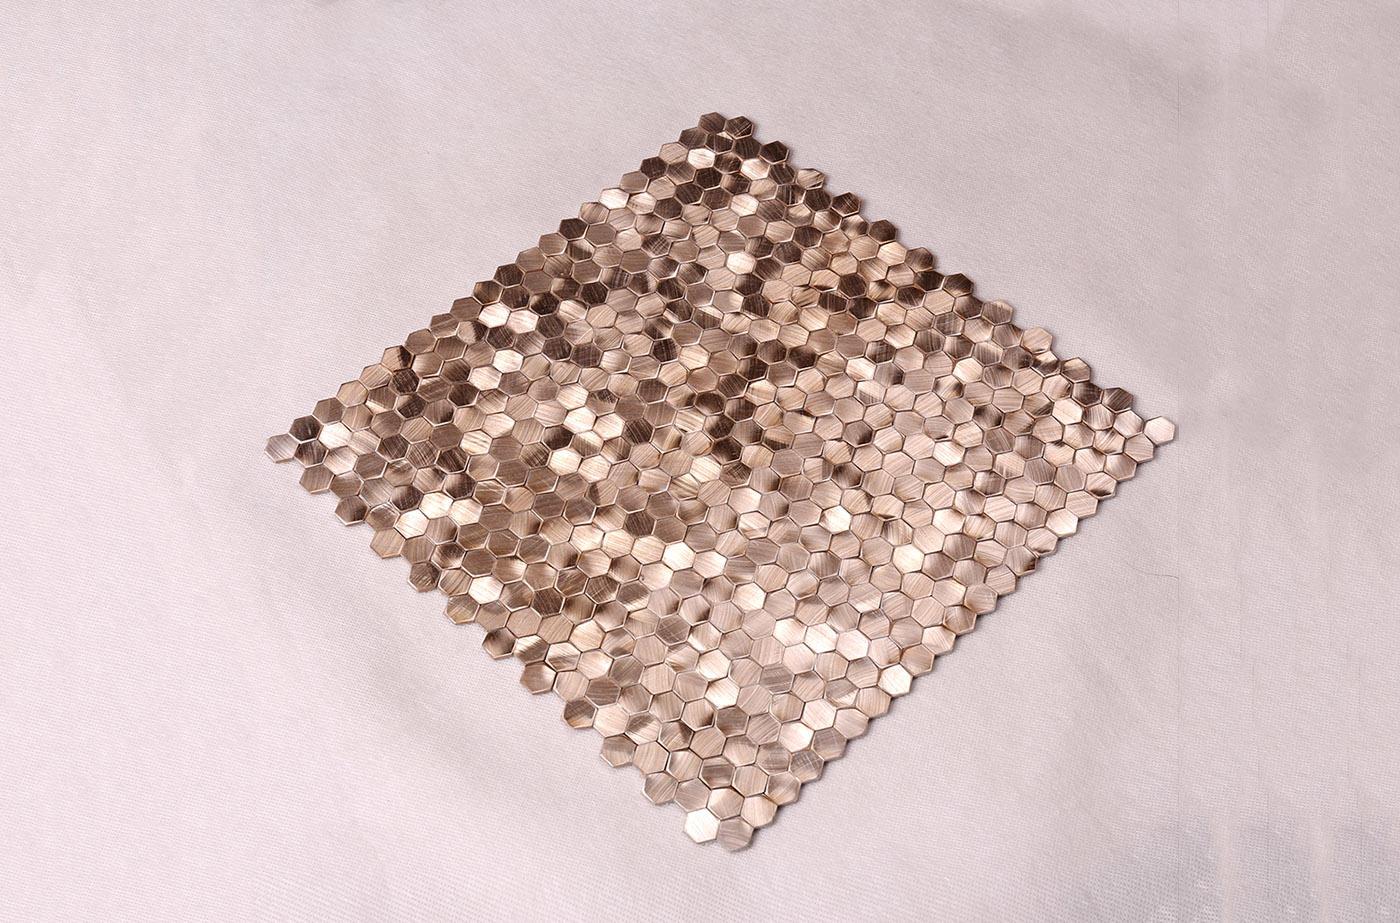 Heng Xing-Find Metallic Kitchen Tiles Preminum Rose Gold 3d Hexagon Stainless Steel